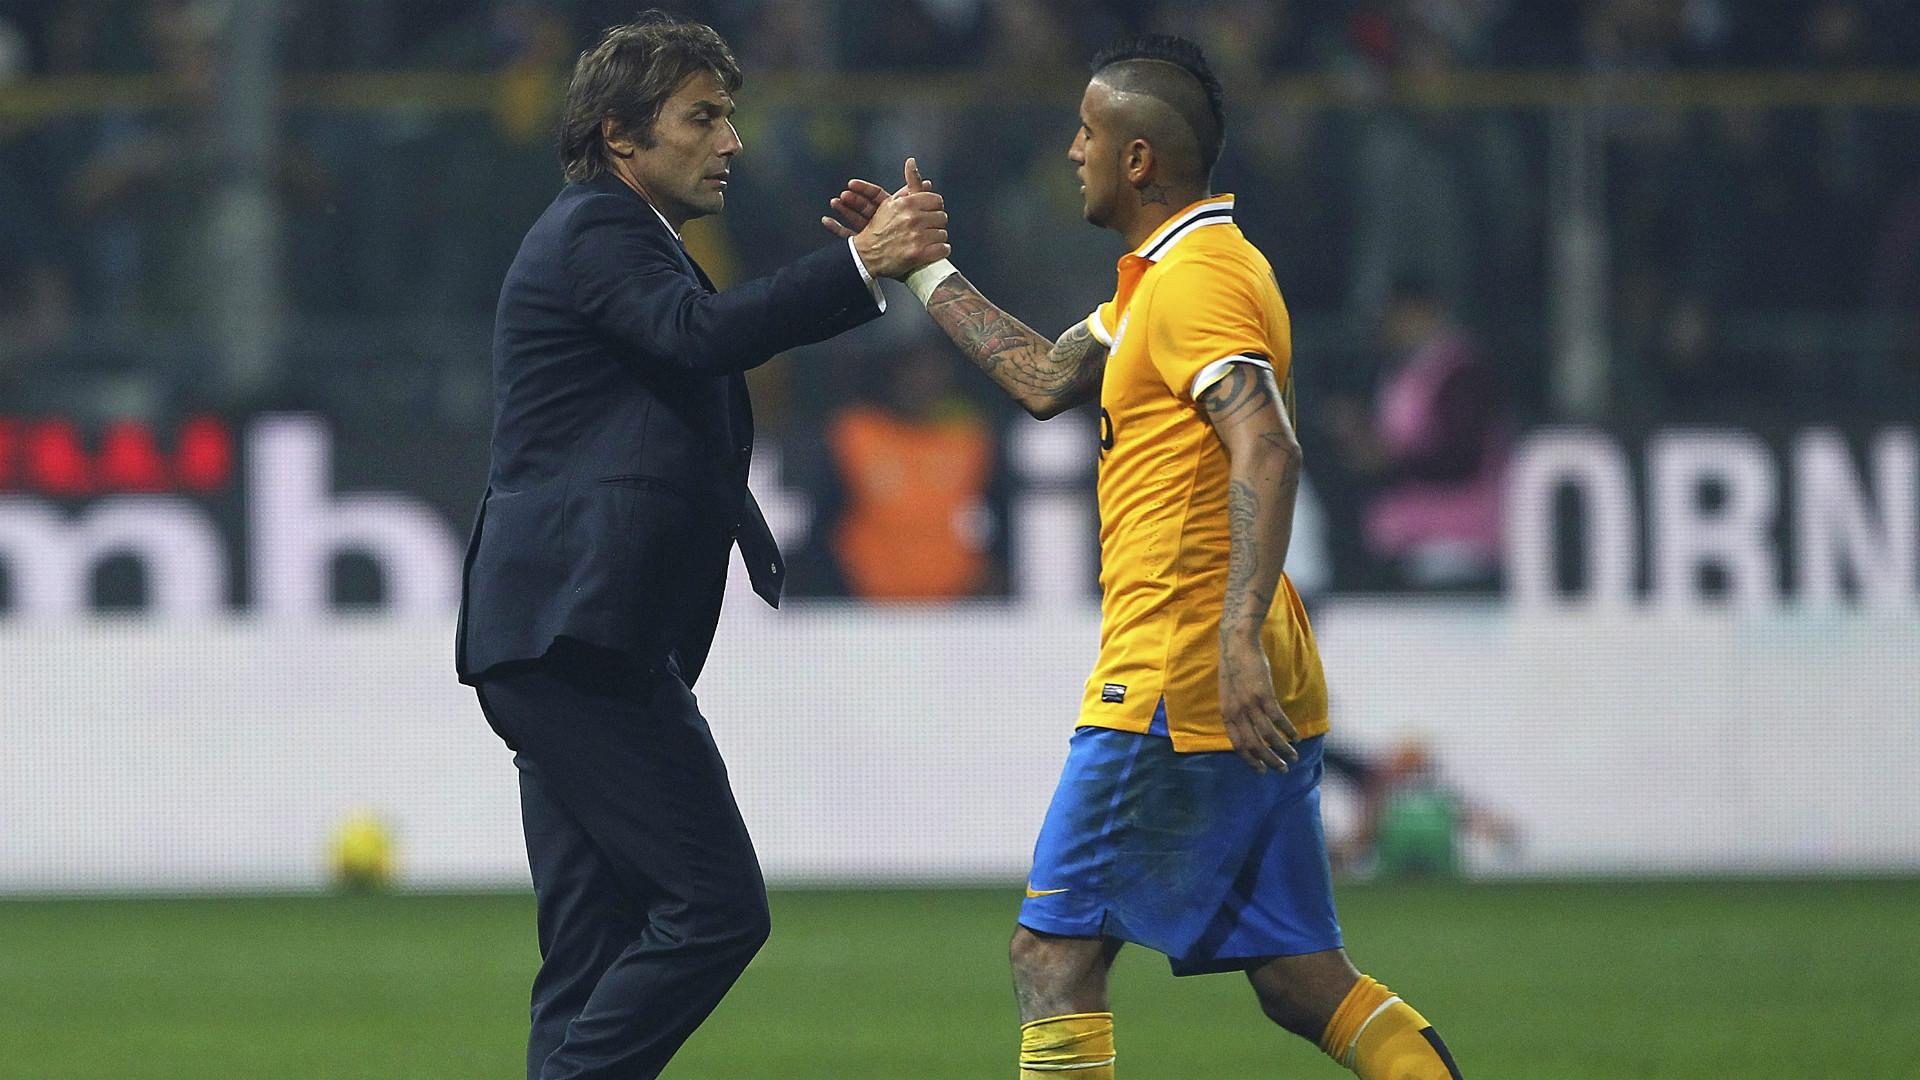 Antonio Conte Arturo Vidal Juventus